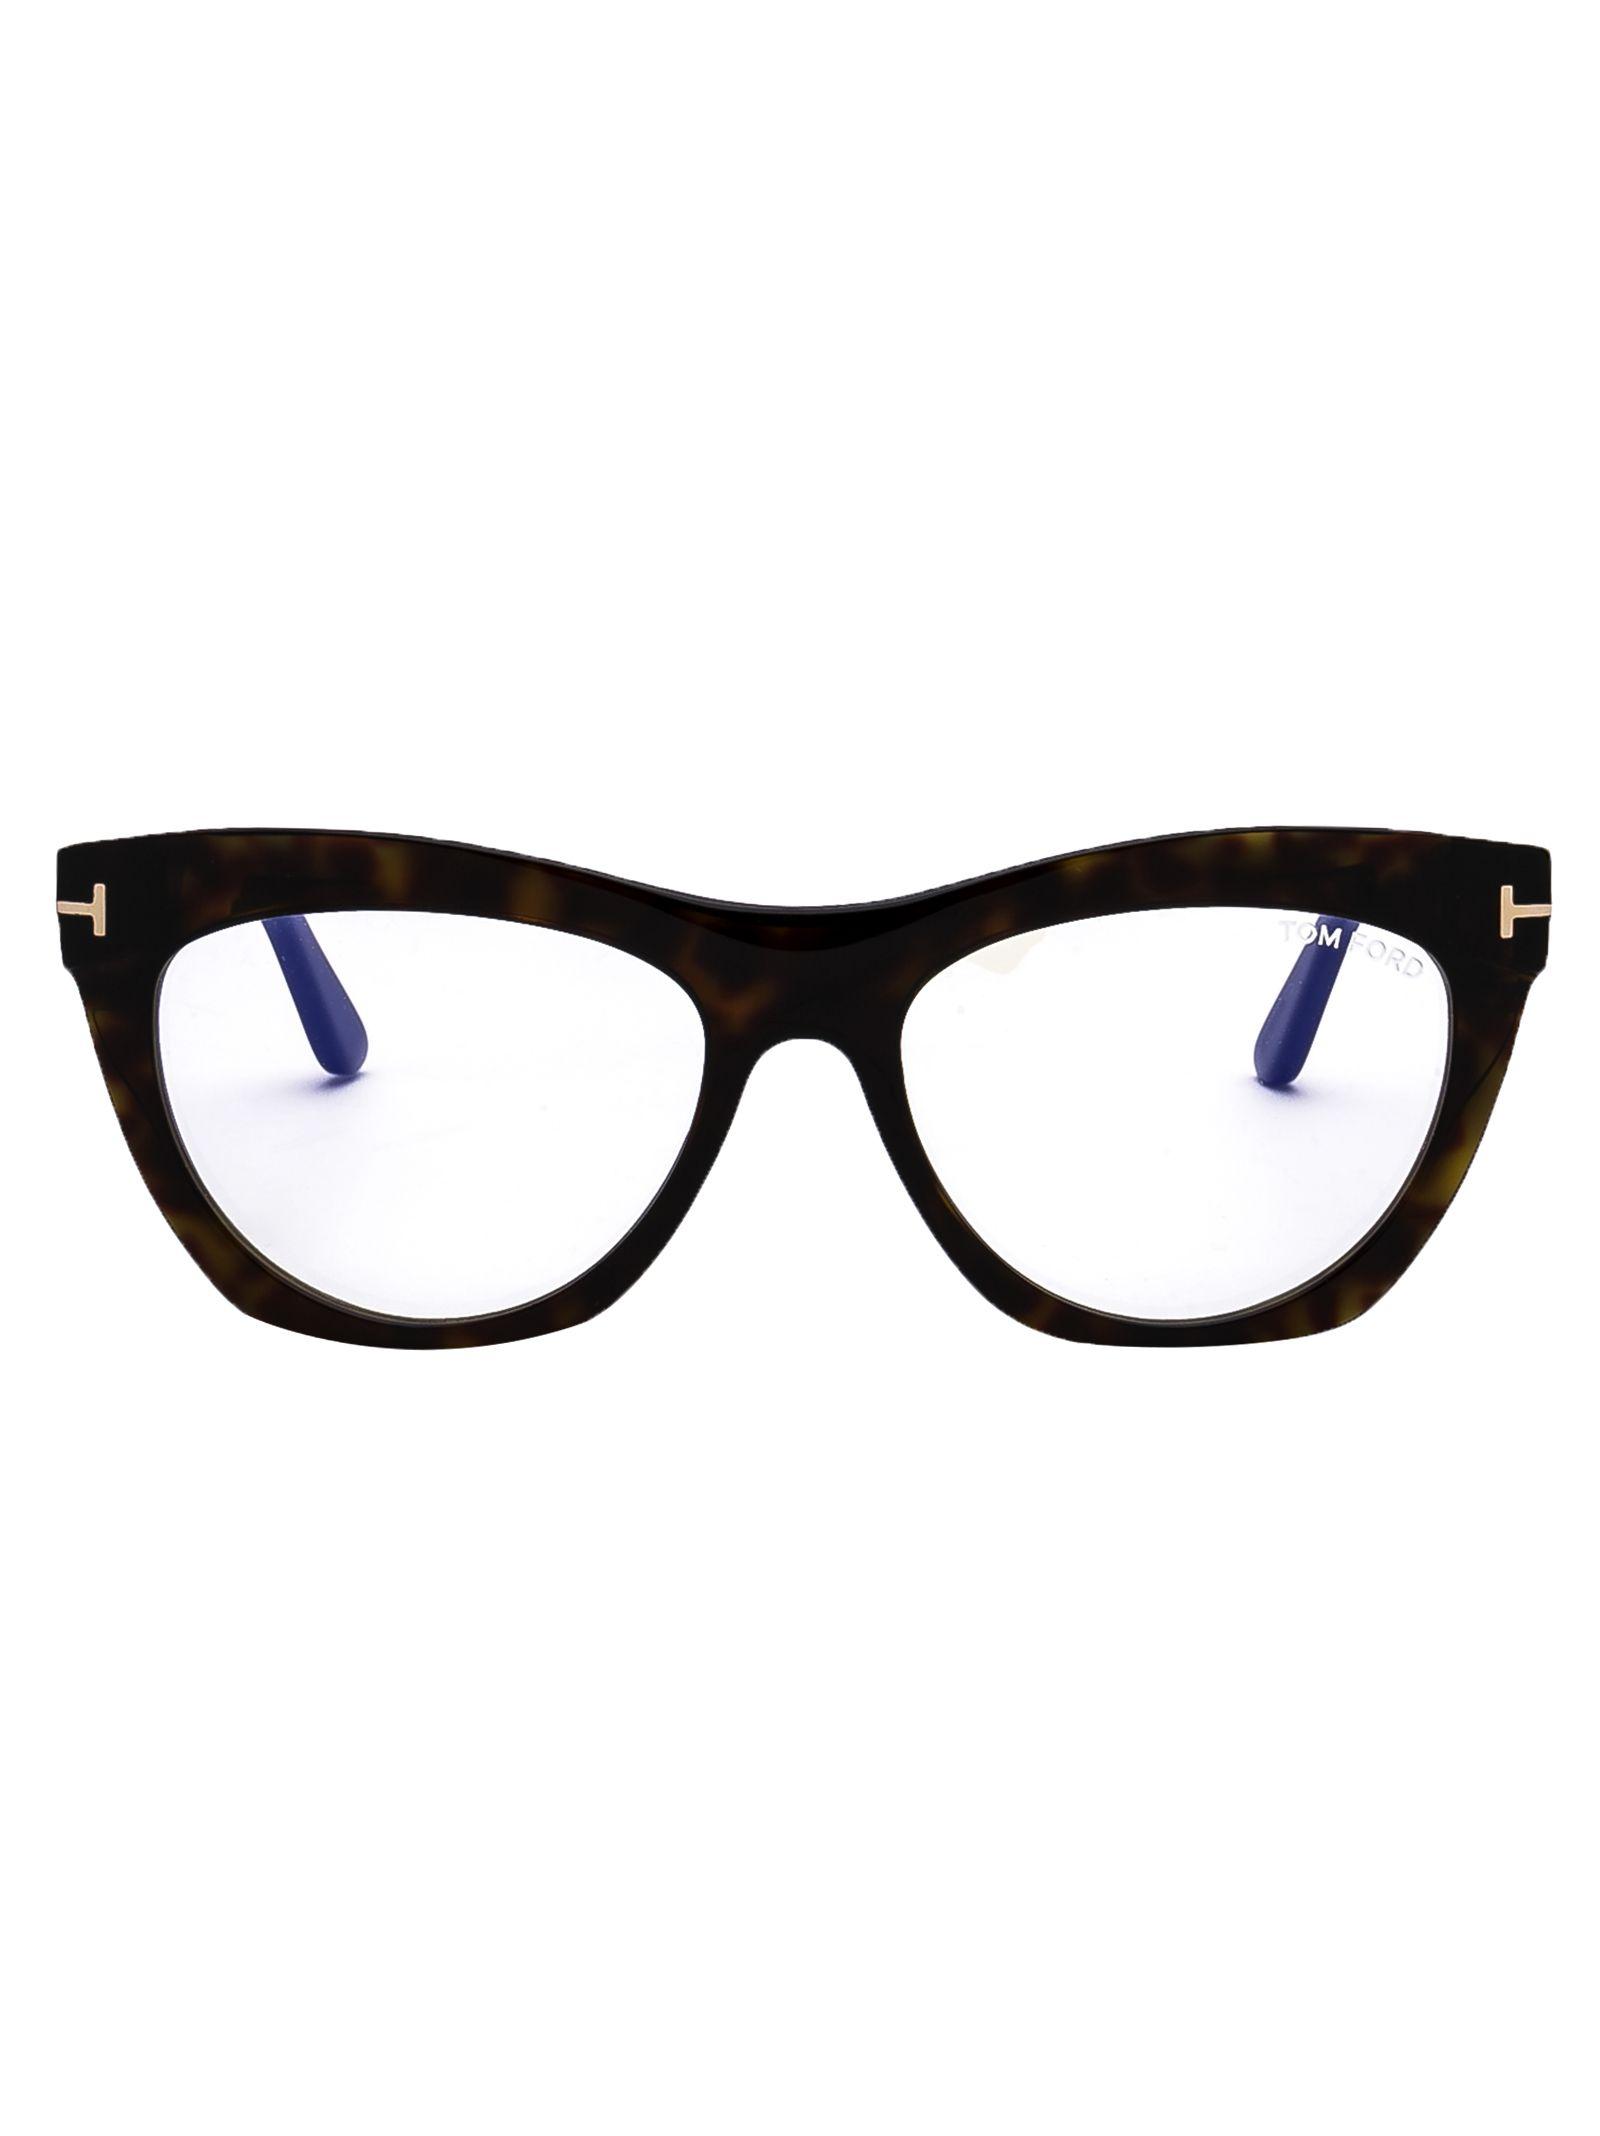 Tom Ford Brown Acetate Glasses